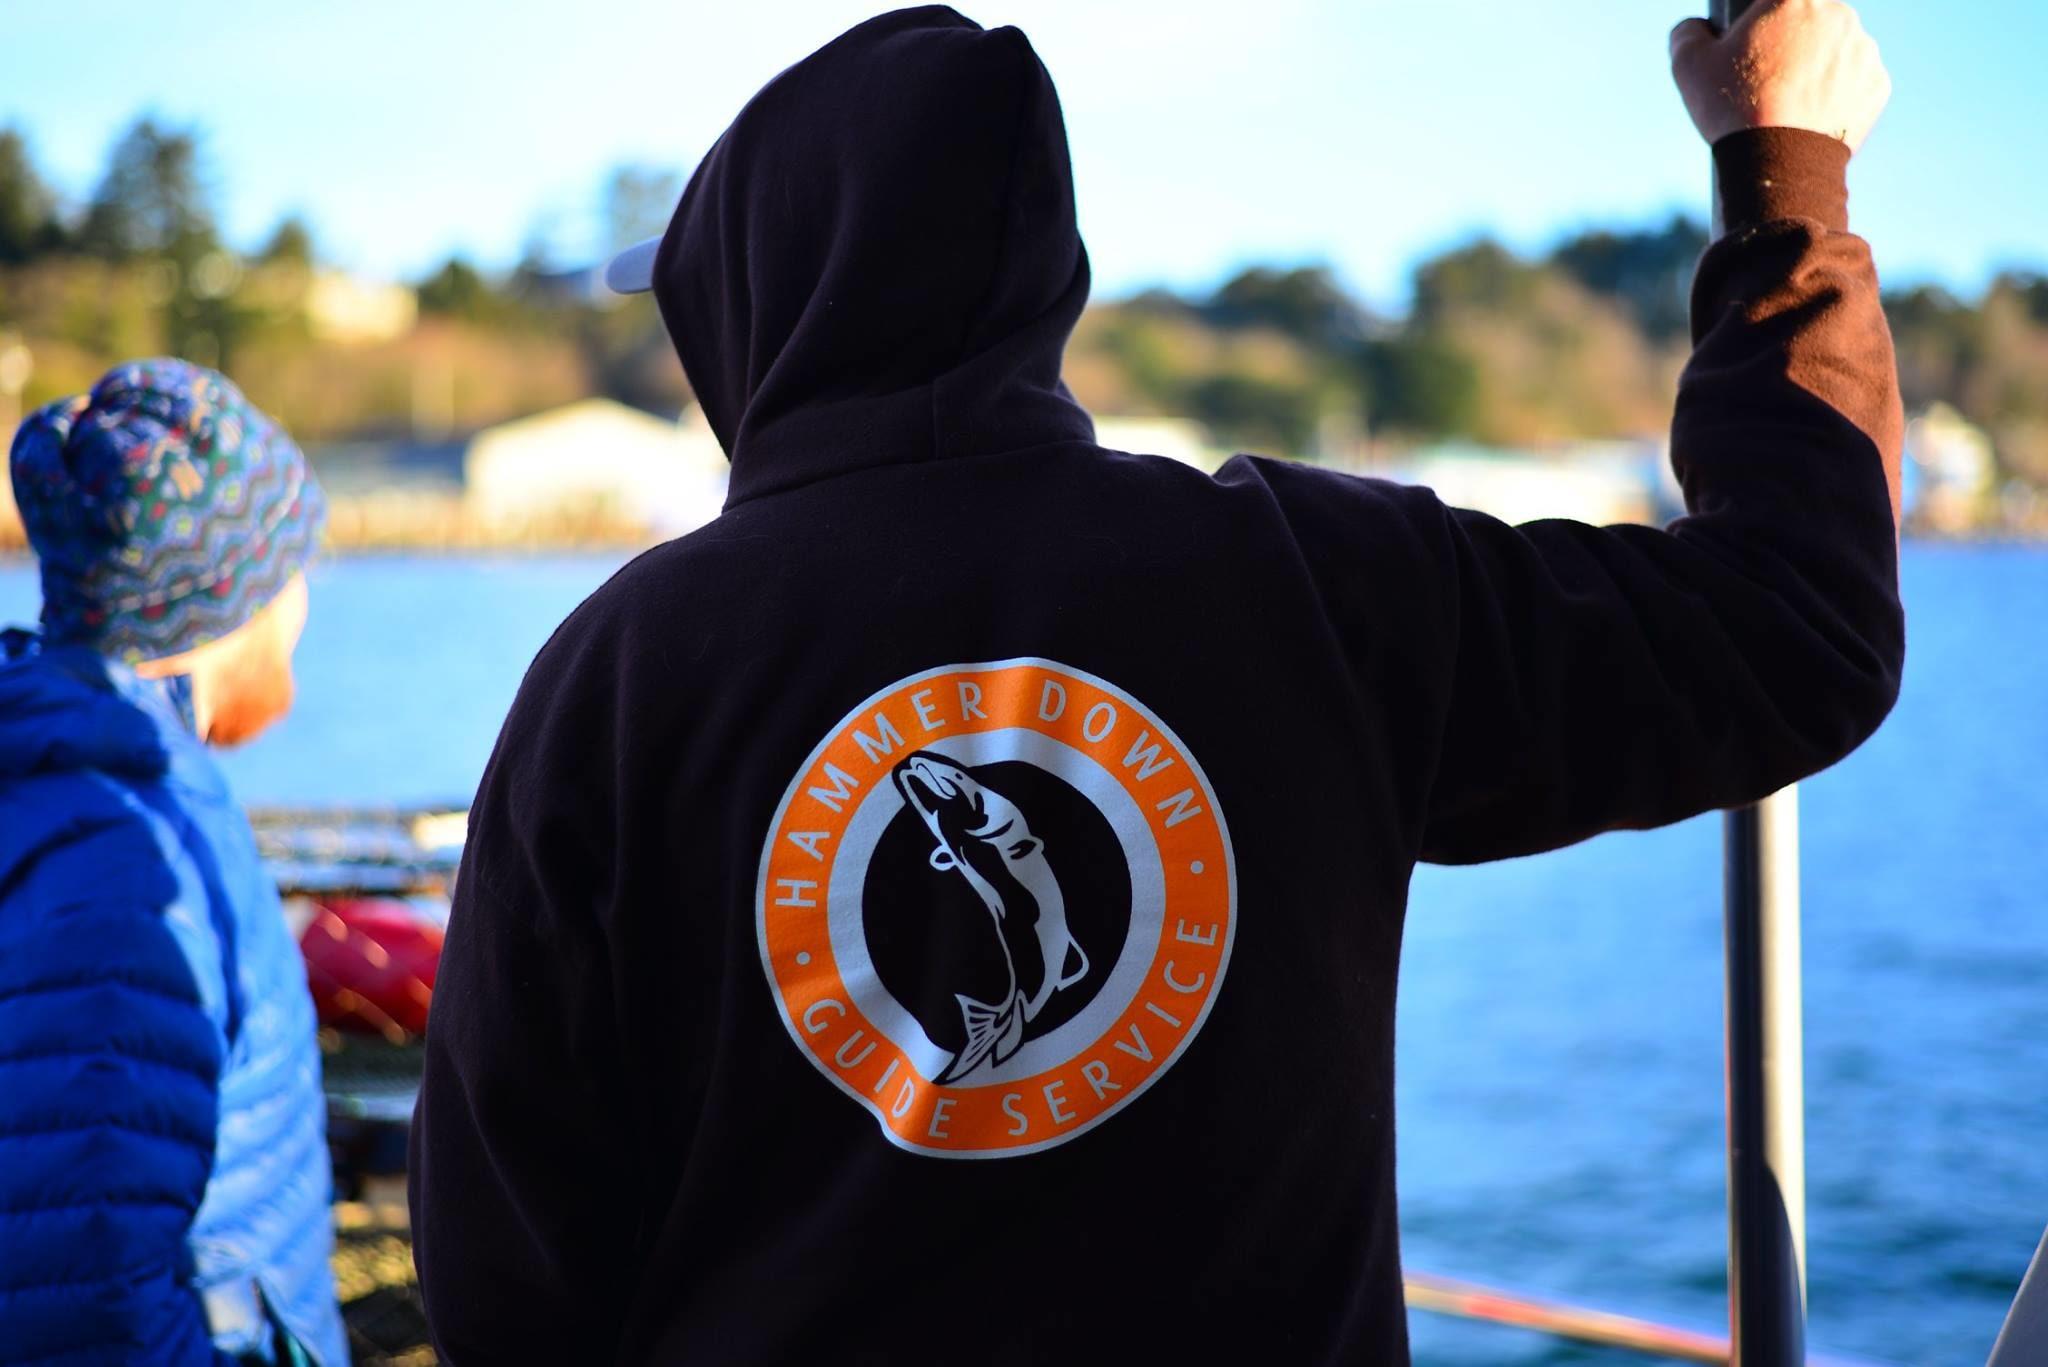 Hammer Down Guide Service: Ocean Fishing